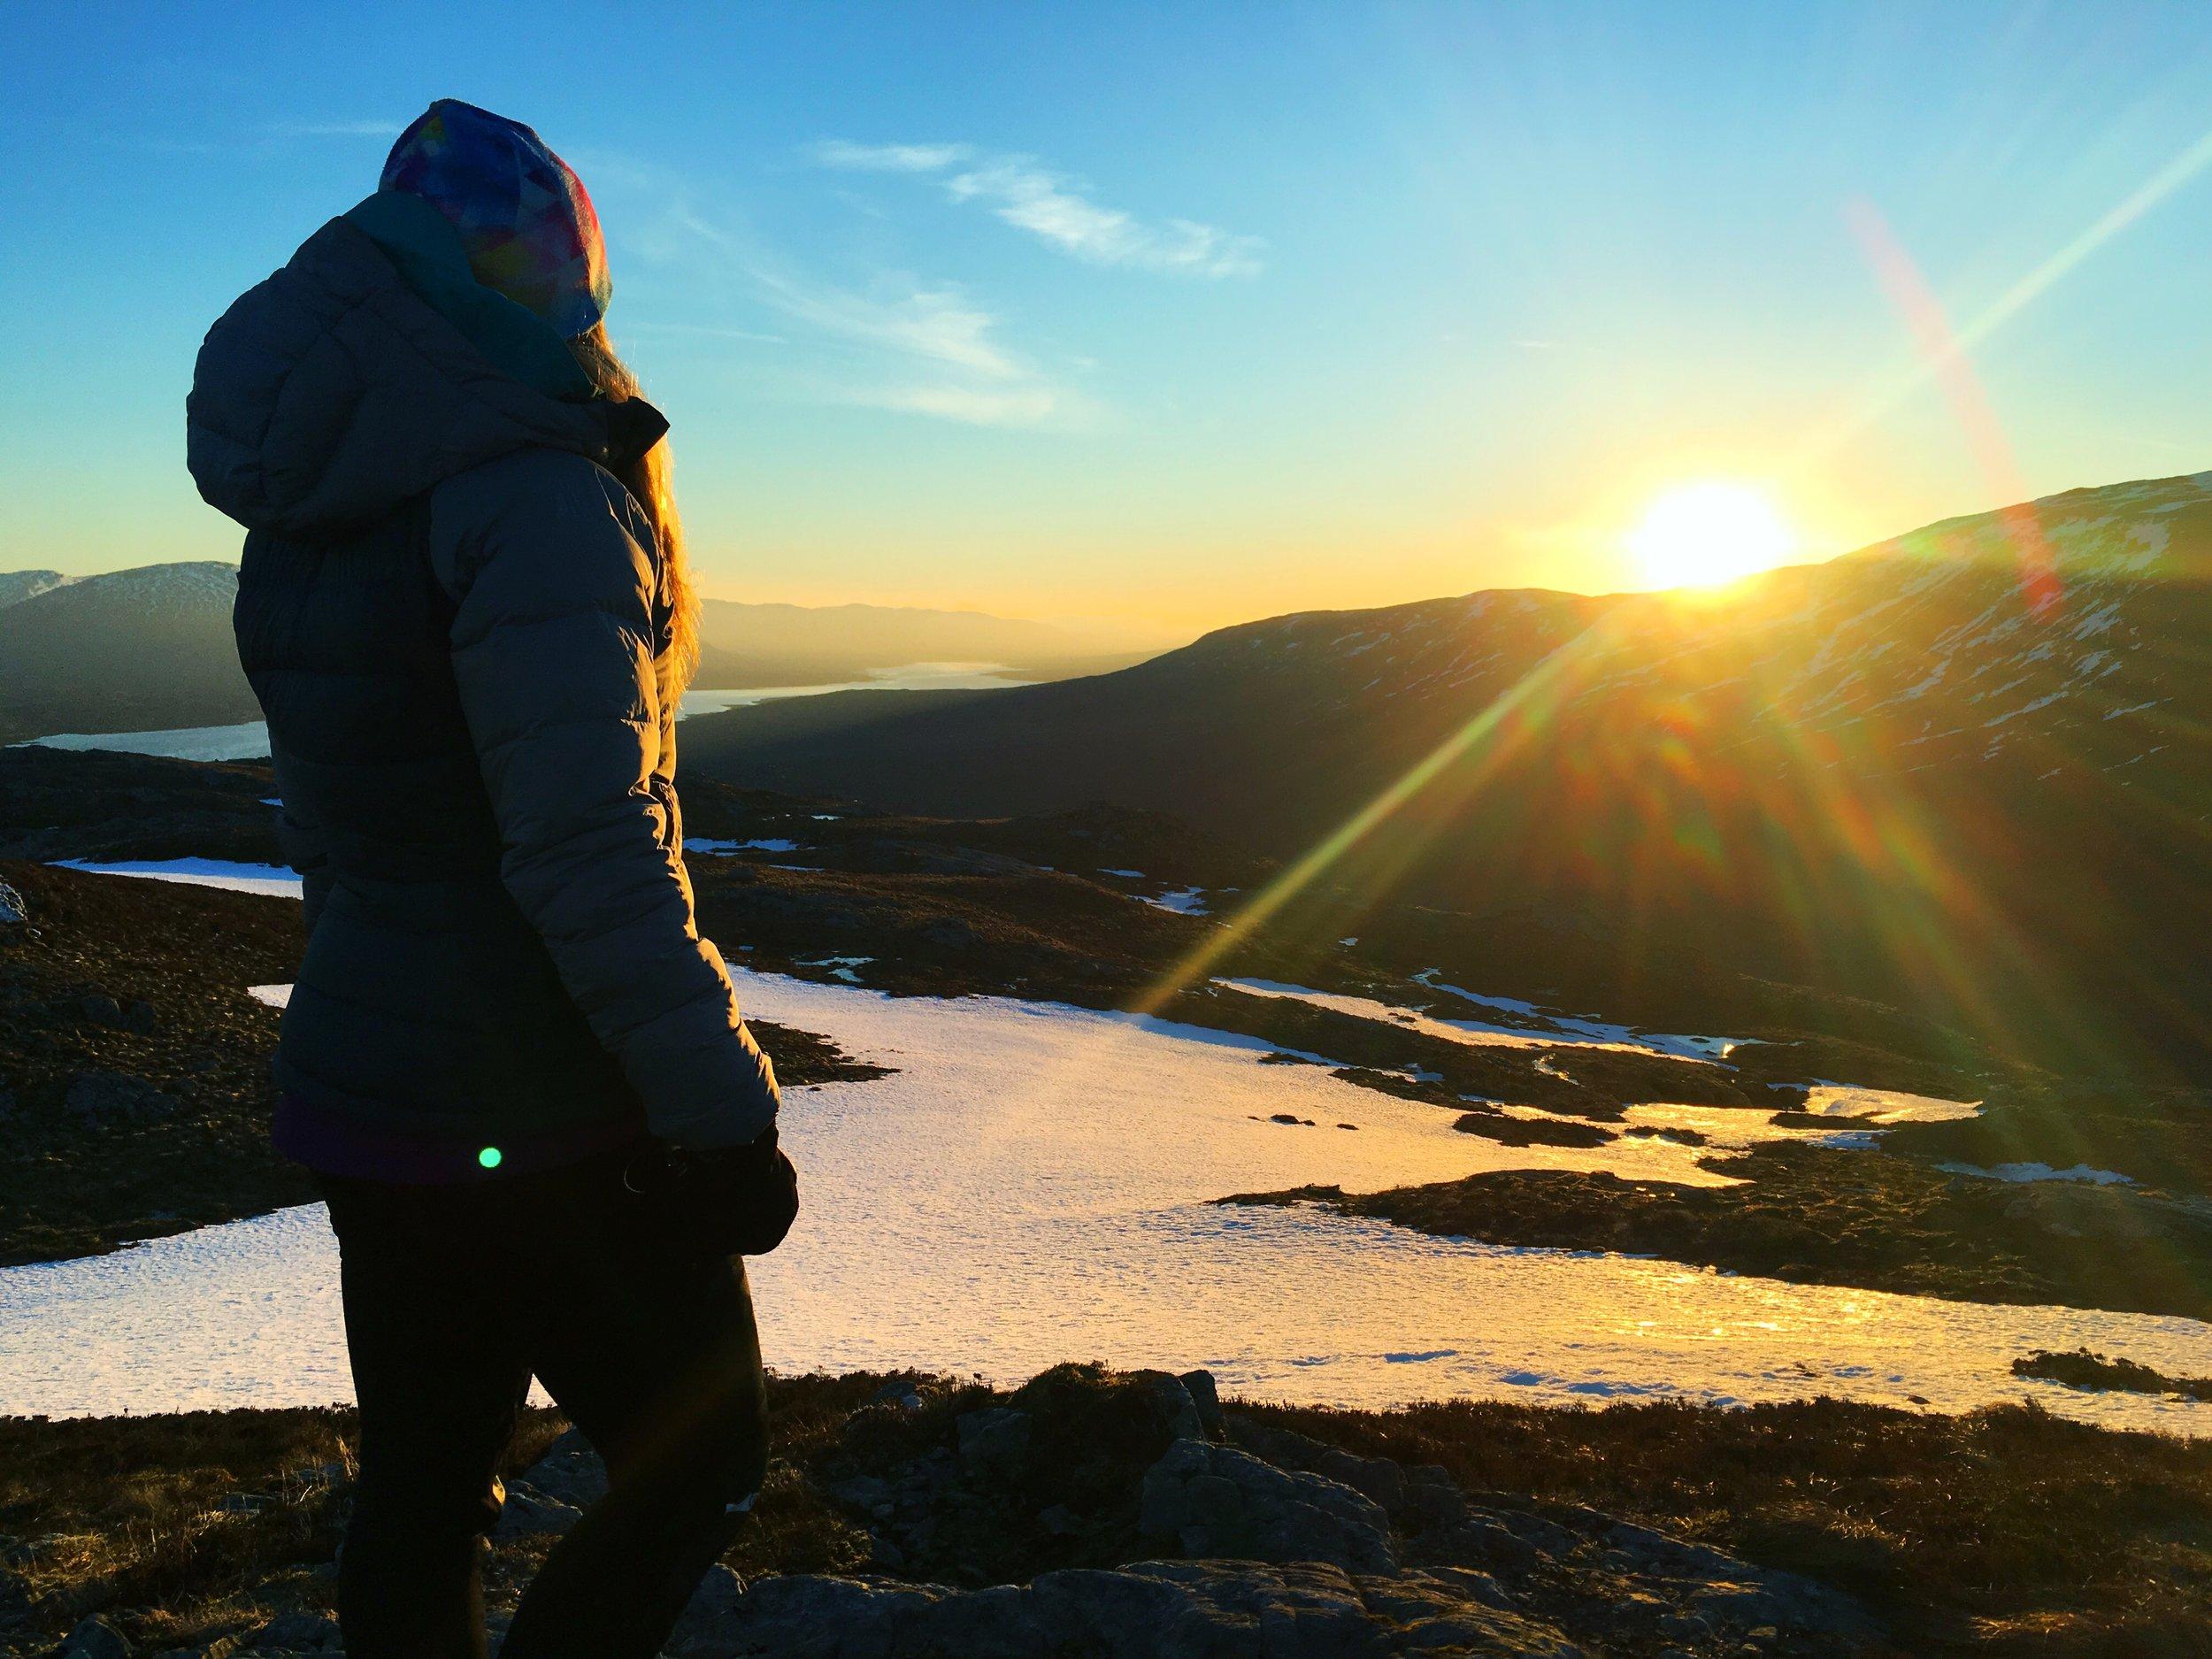 Sophie Radcliffe, Winter Adventures inspiration